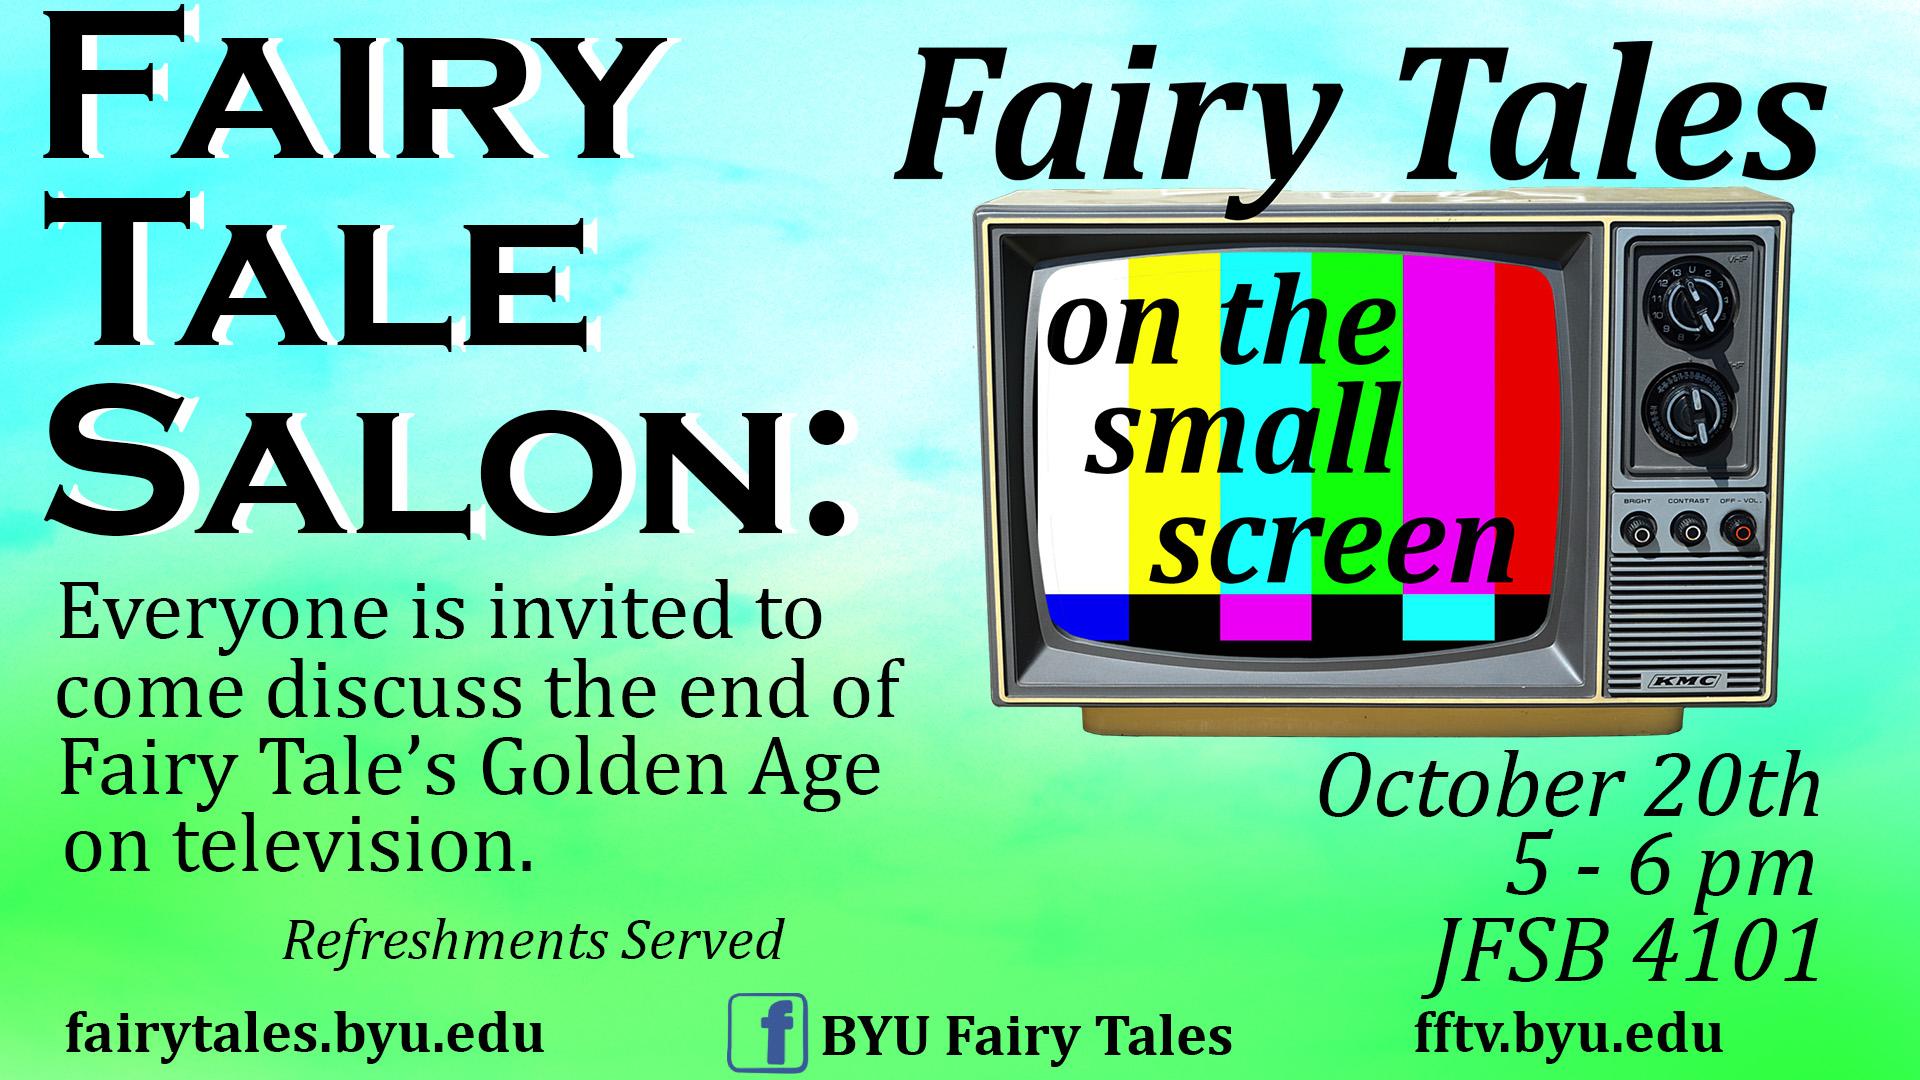 Fairy Tale Salon Signage